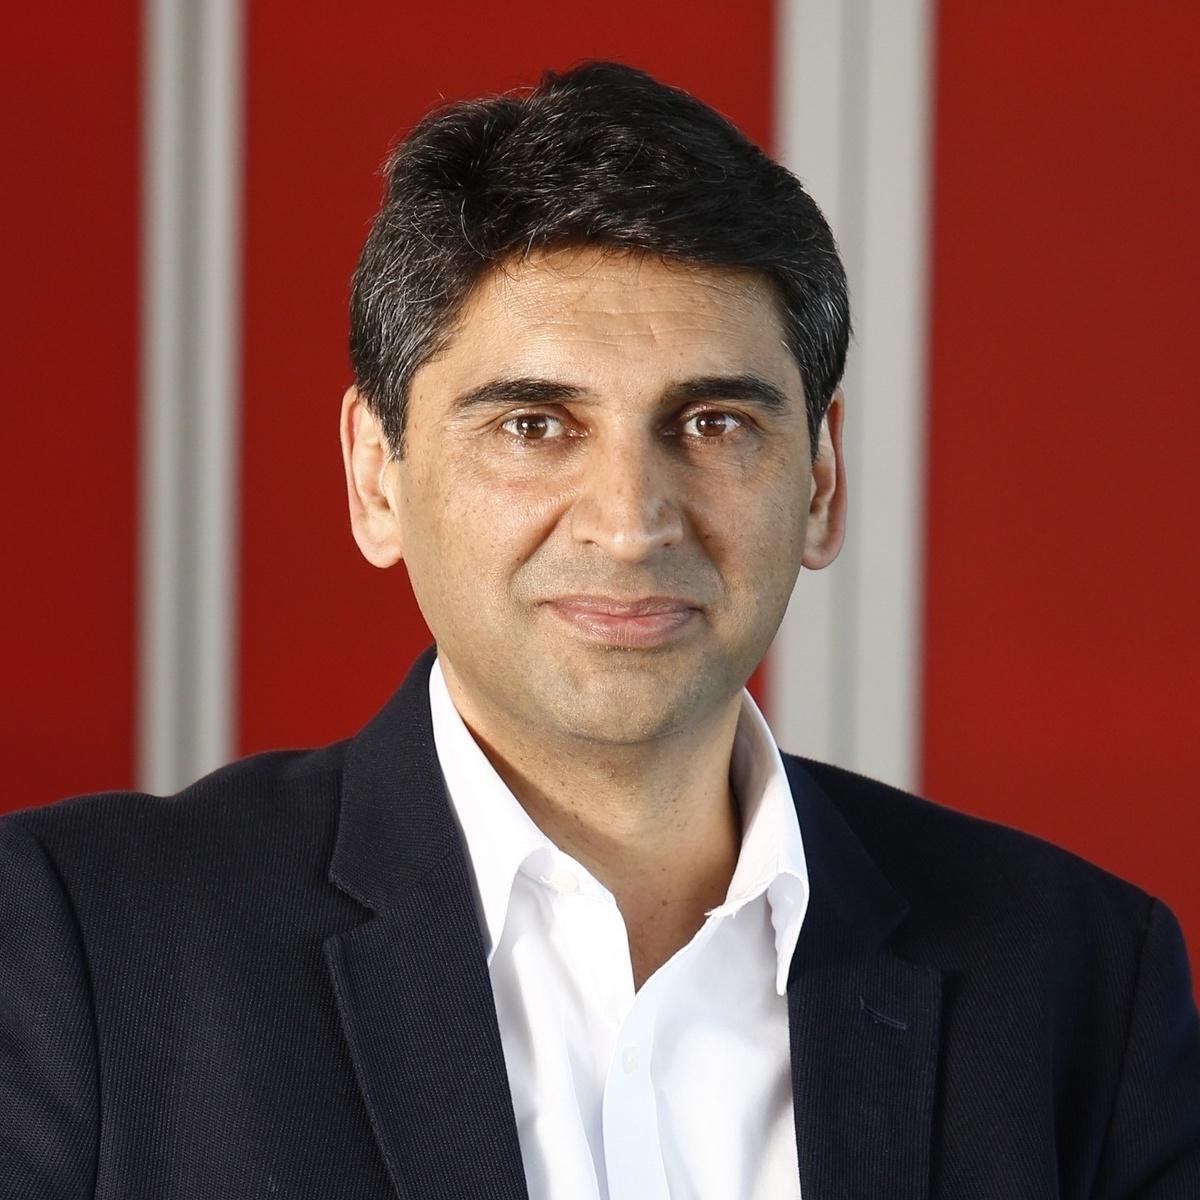 KFC appoints Pakistan's IBA graduate Sabir Sami as its global CEO